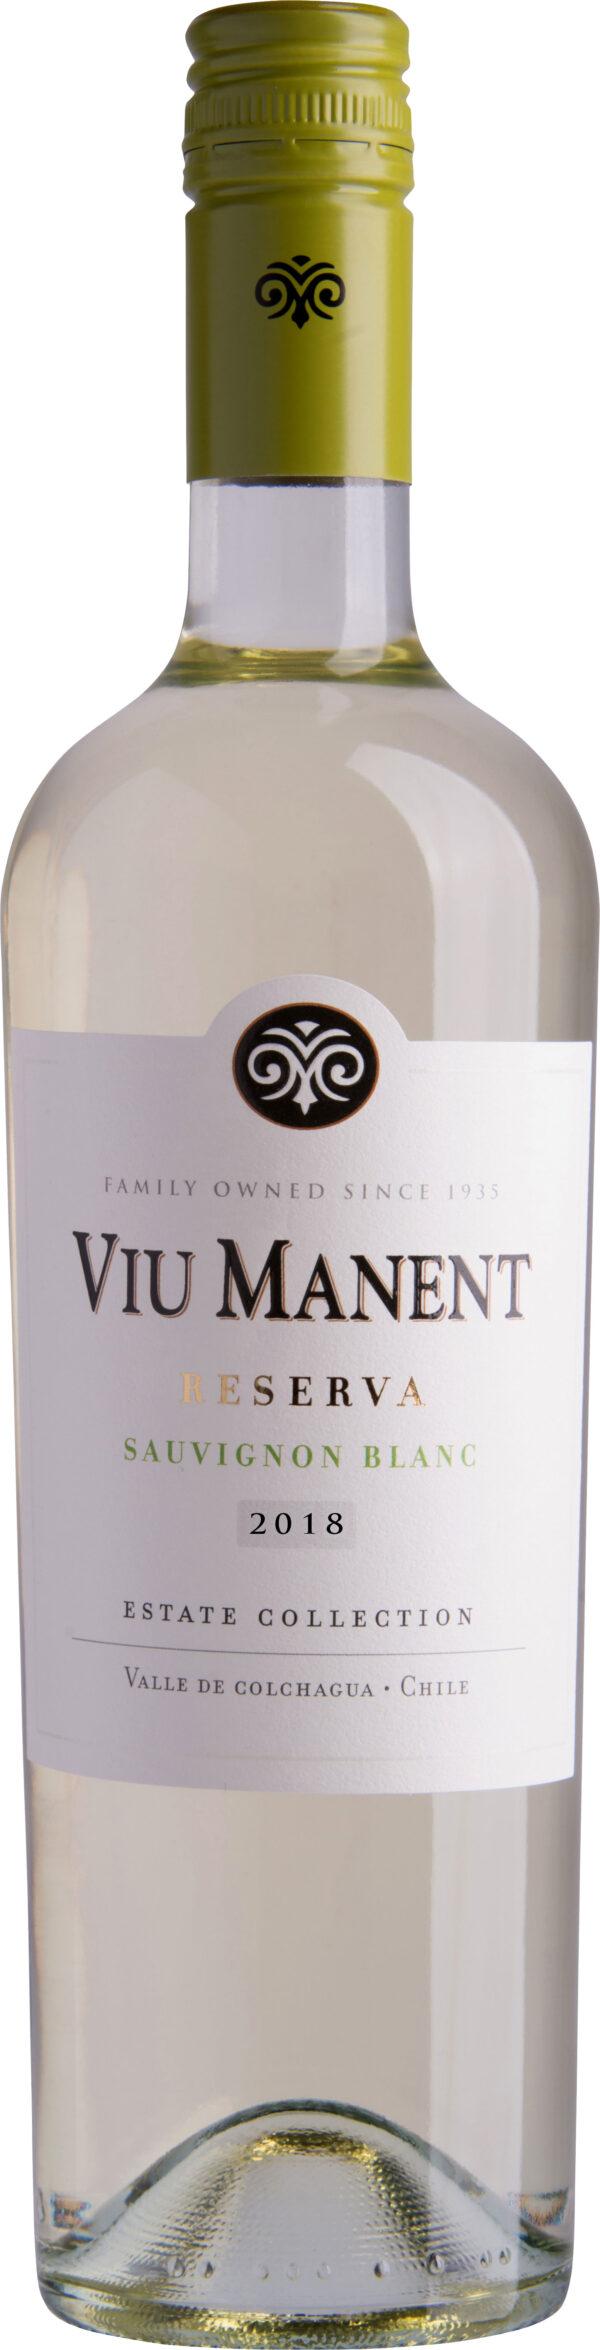 Viu Manent - Estate Collection Reserva Sauvignon Blanc 2019 75cl Bottle